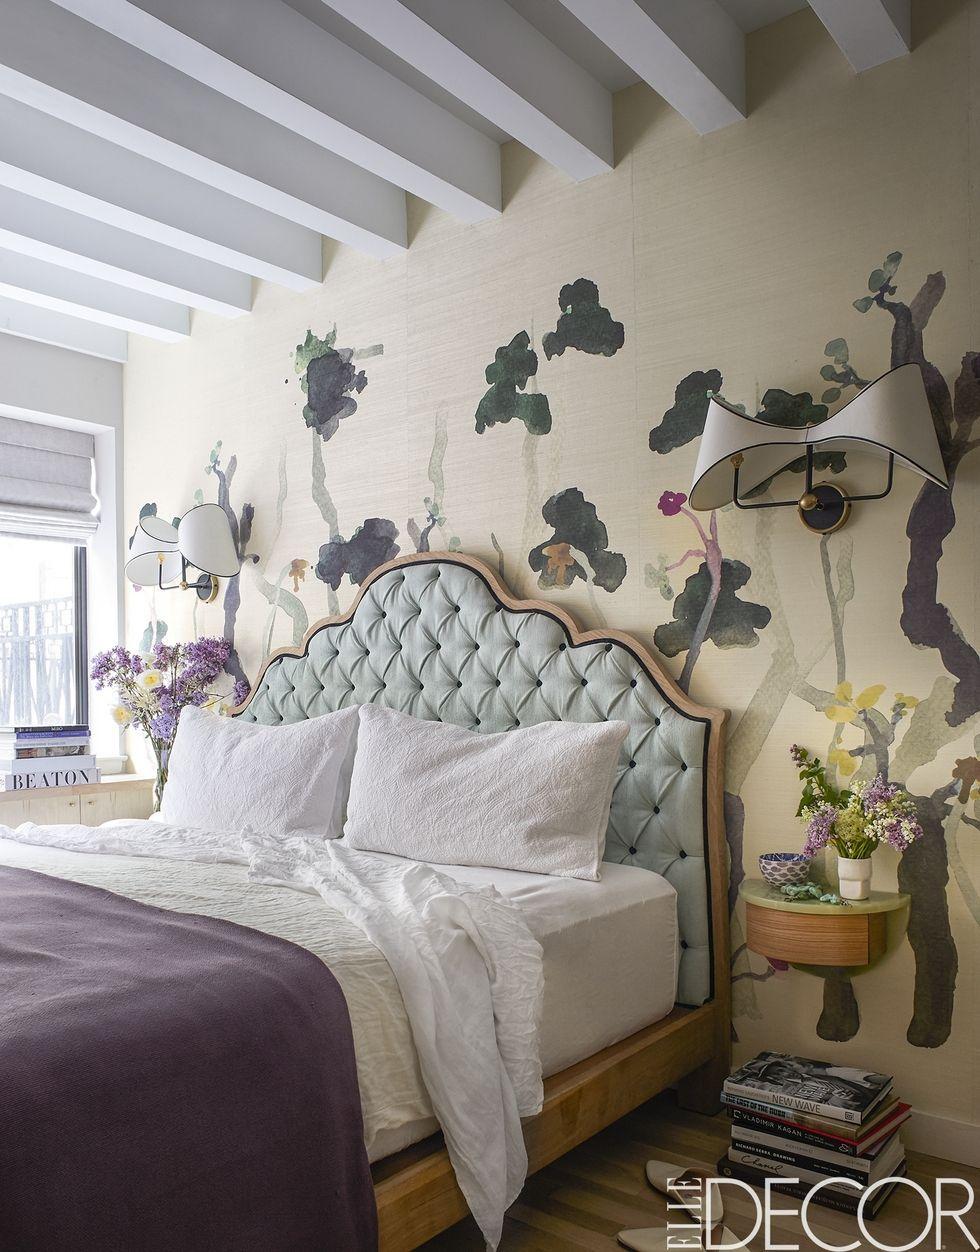 12 Innovative Wallpaper Design Ideas - Colorful Wallpaper for Walls